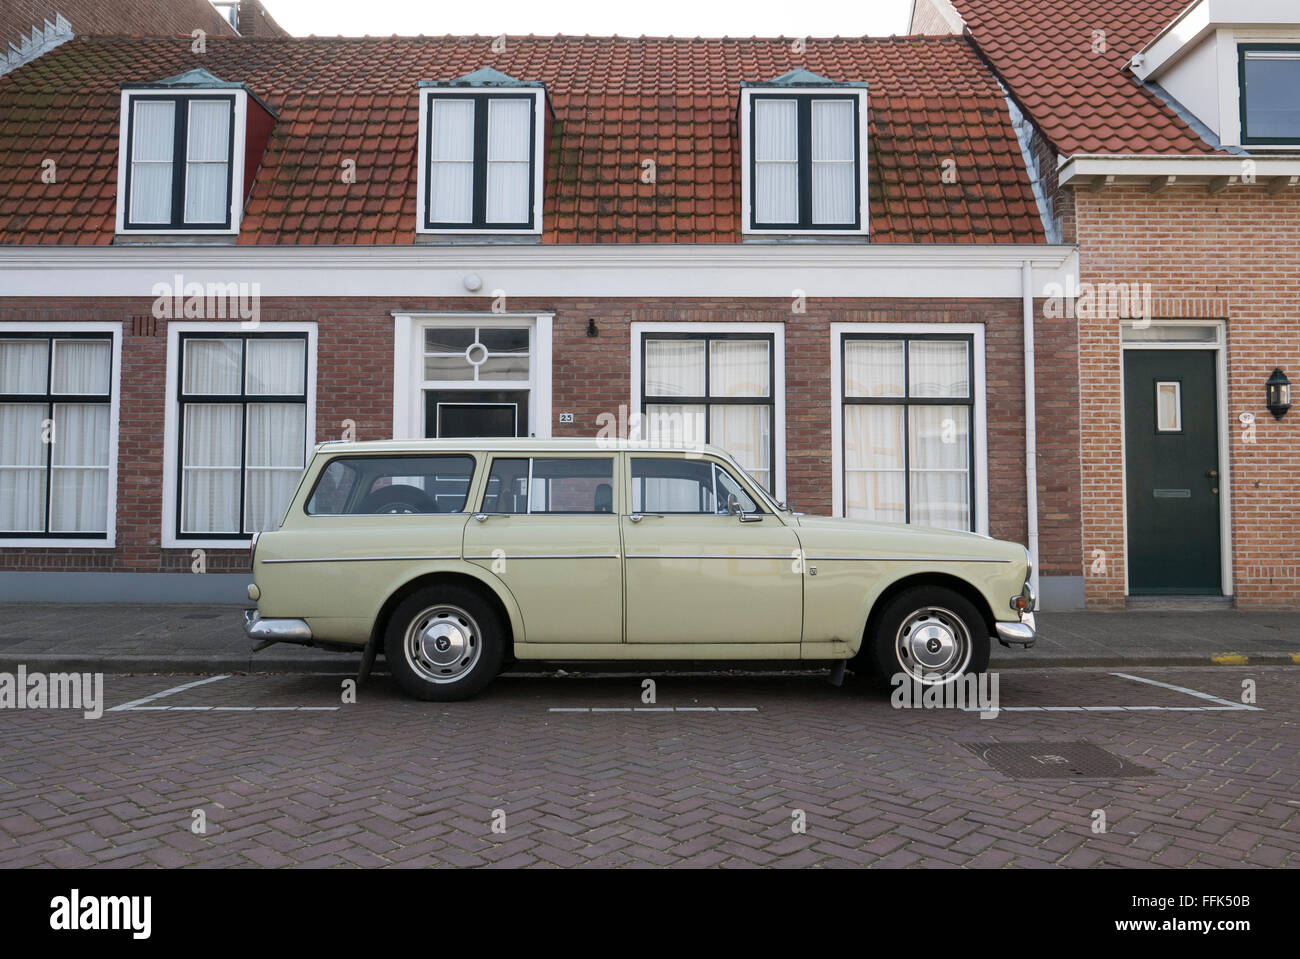 Volvo oldtimer, Domburg, North Sea Coast, Zeeland, Netherlands - Stock Image